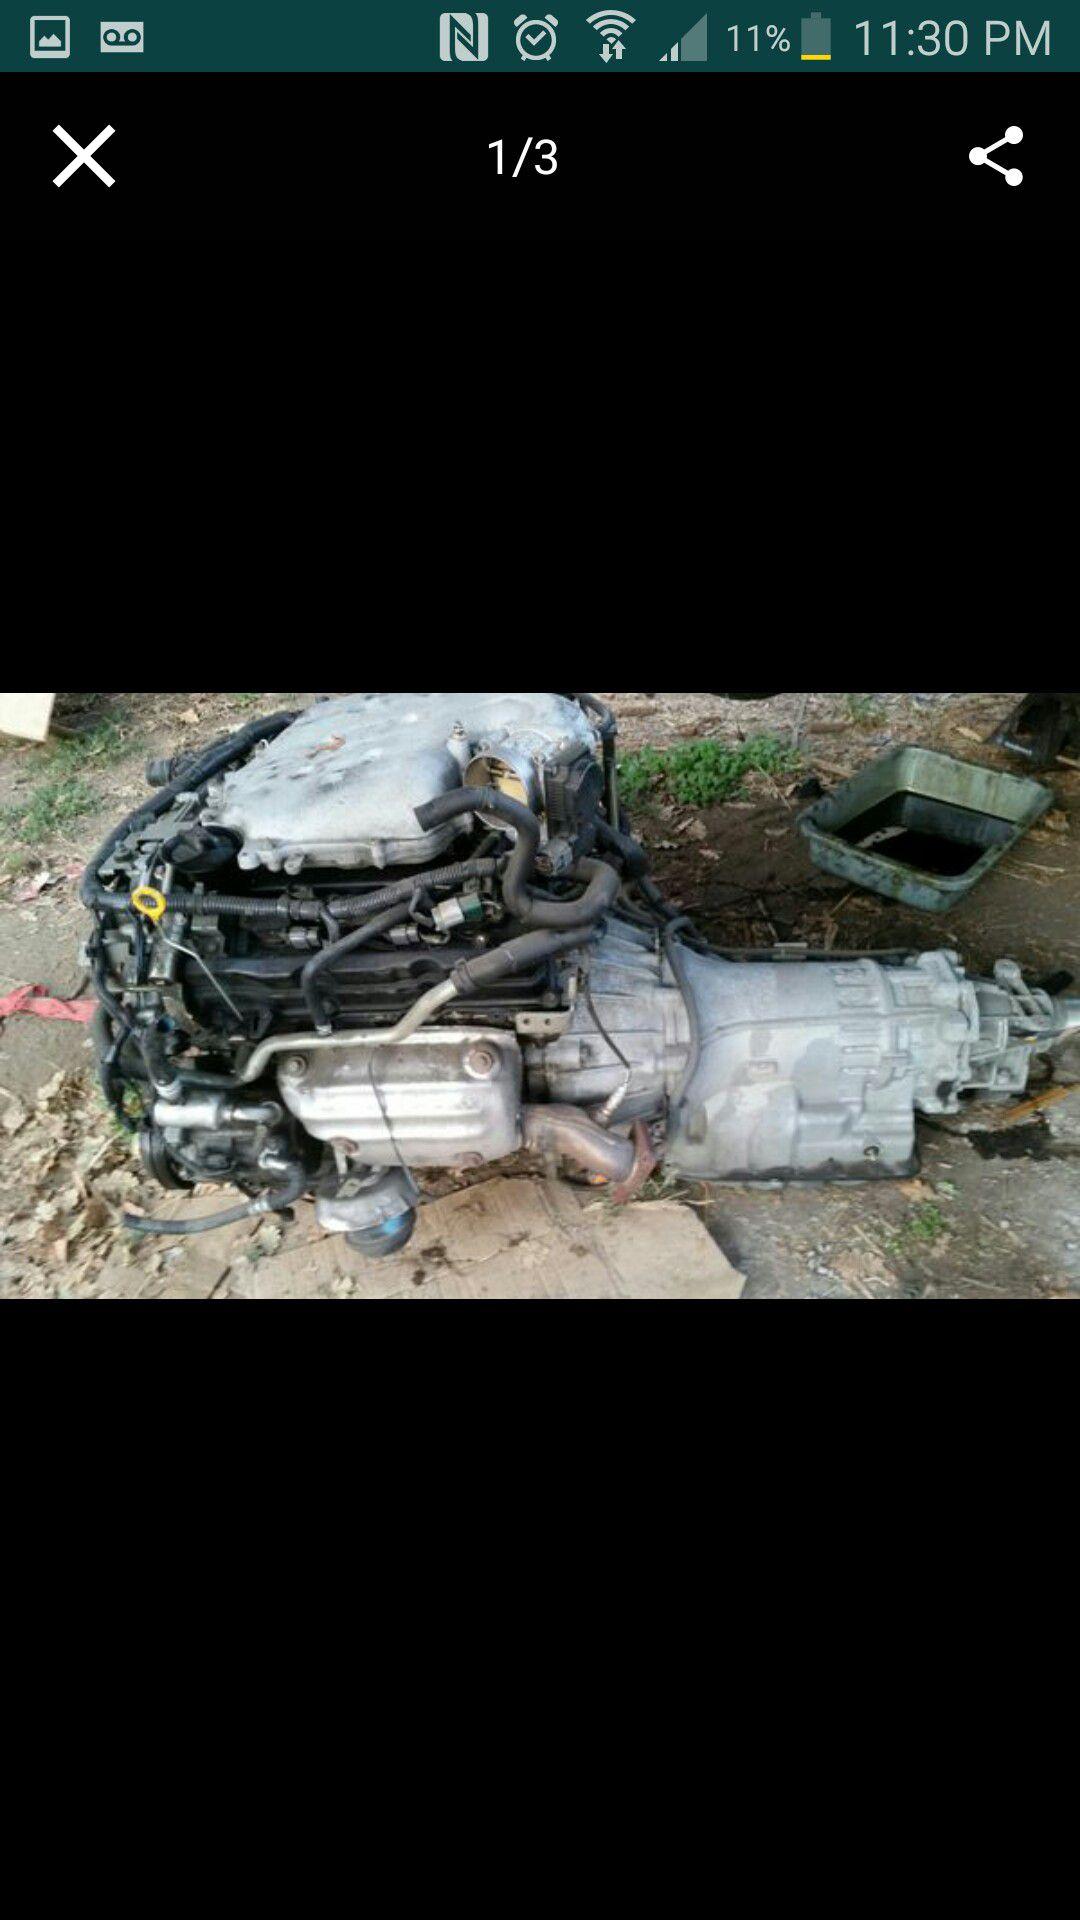 03 infiniti g35 engine and transmission